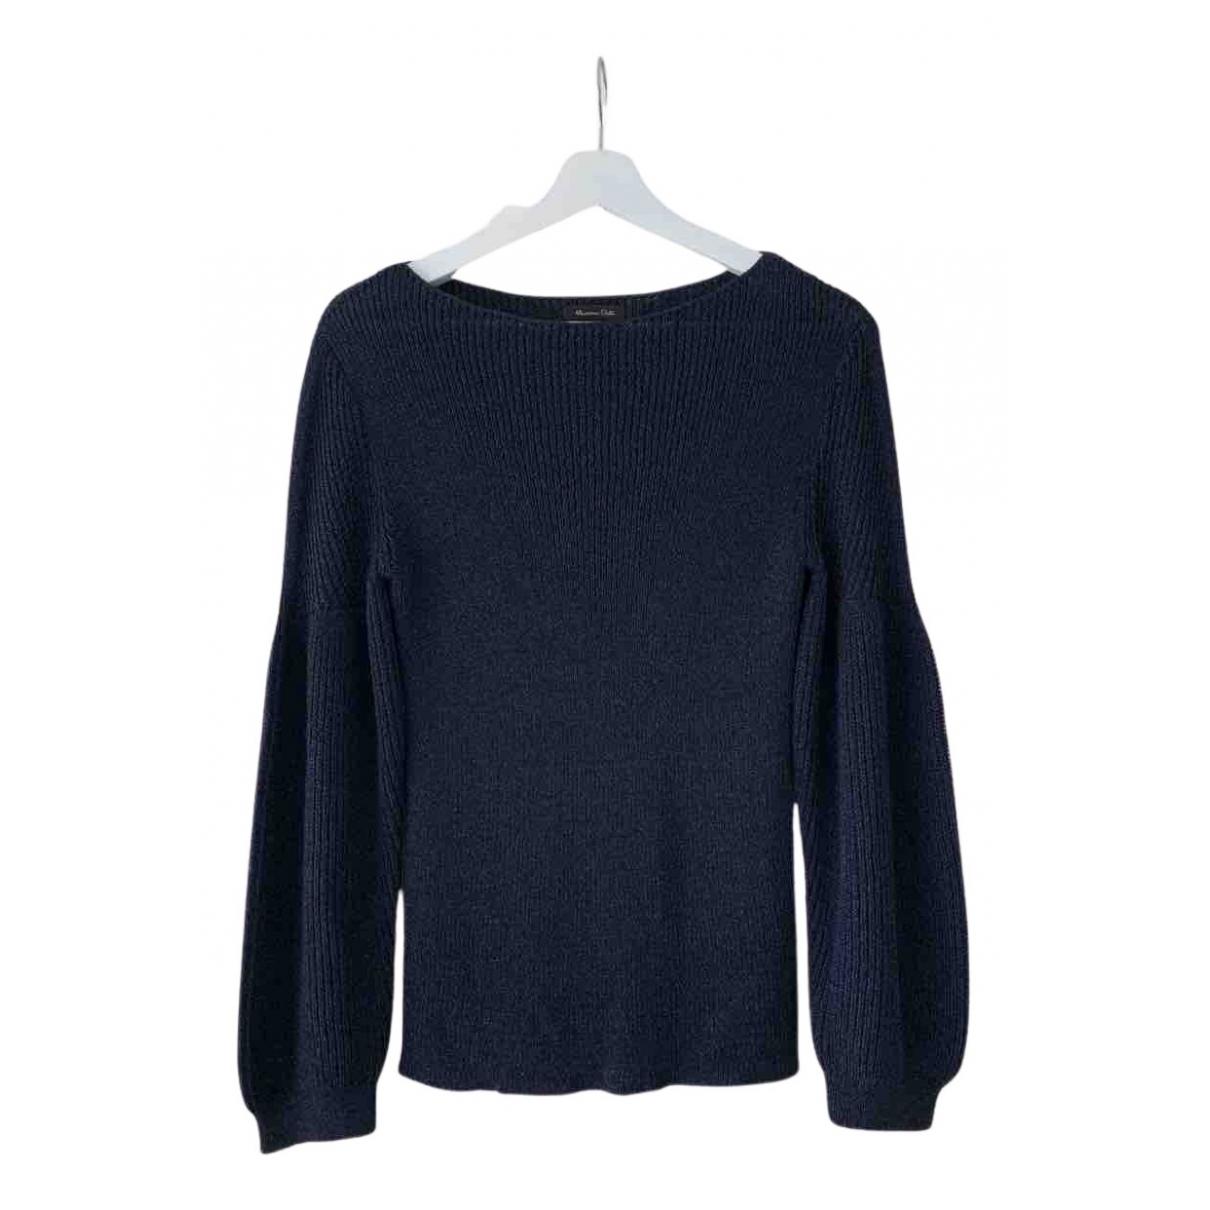 Massimo Dutti N Blue Cotton Knitwear for Women S International